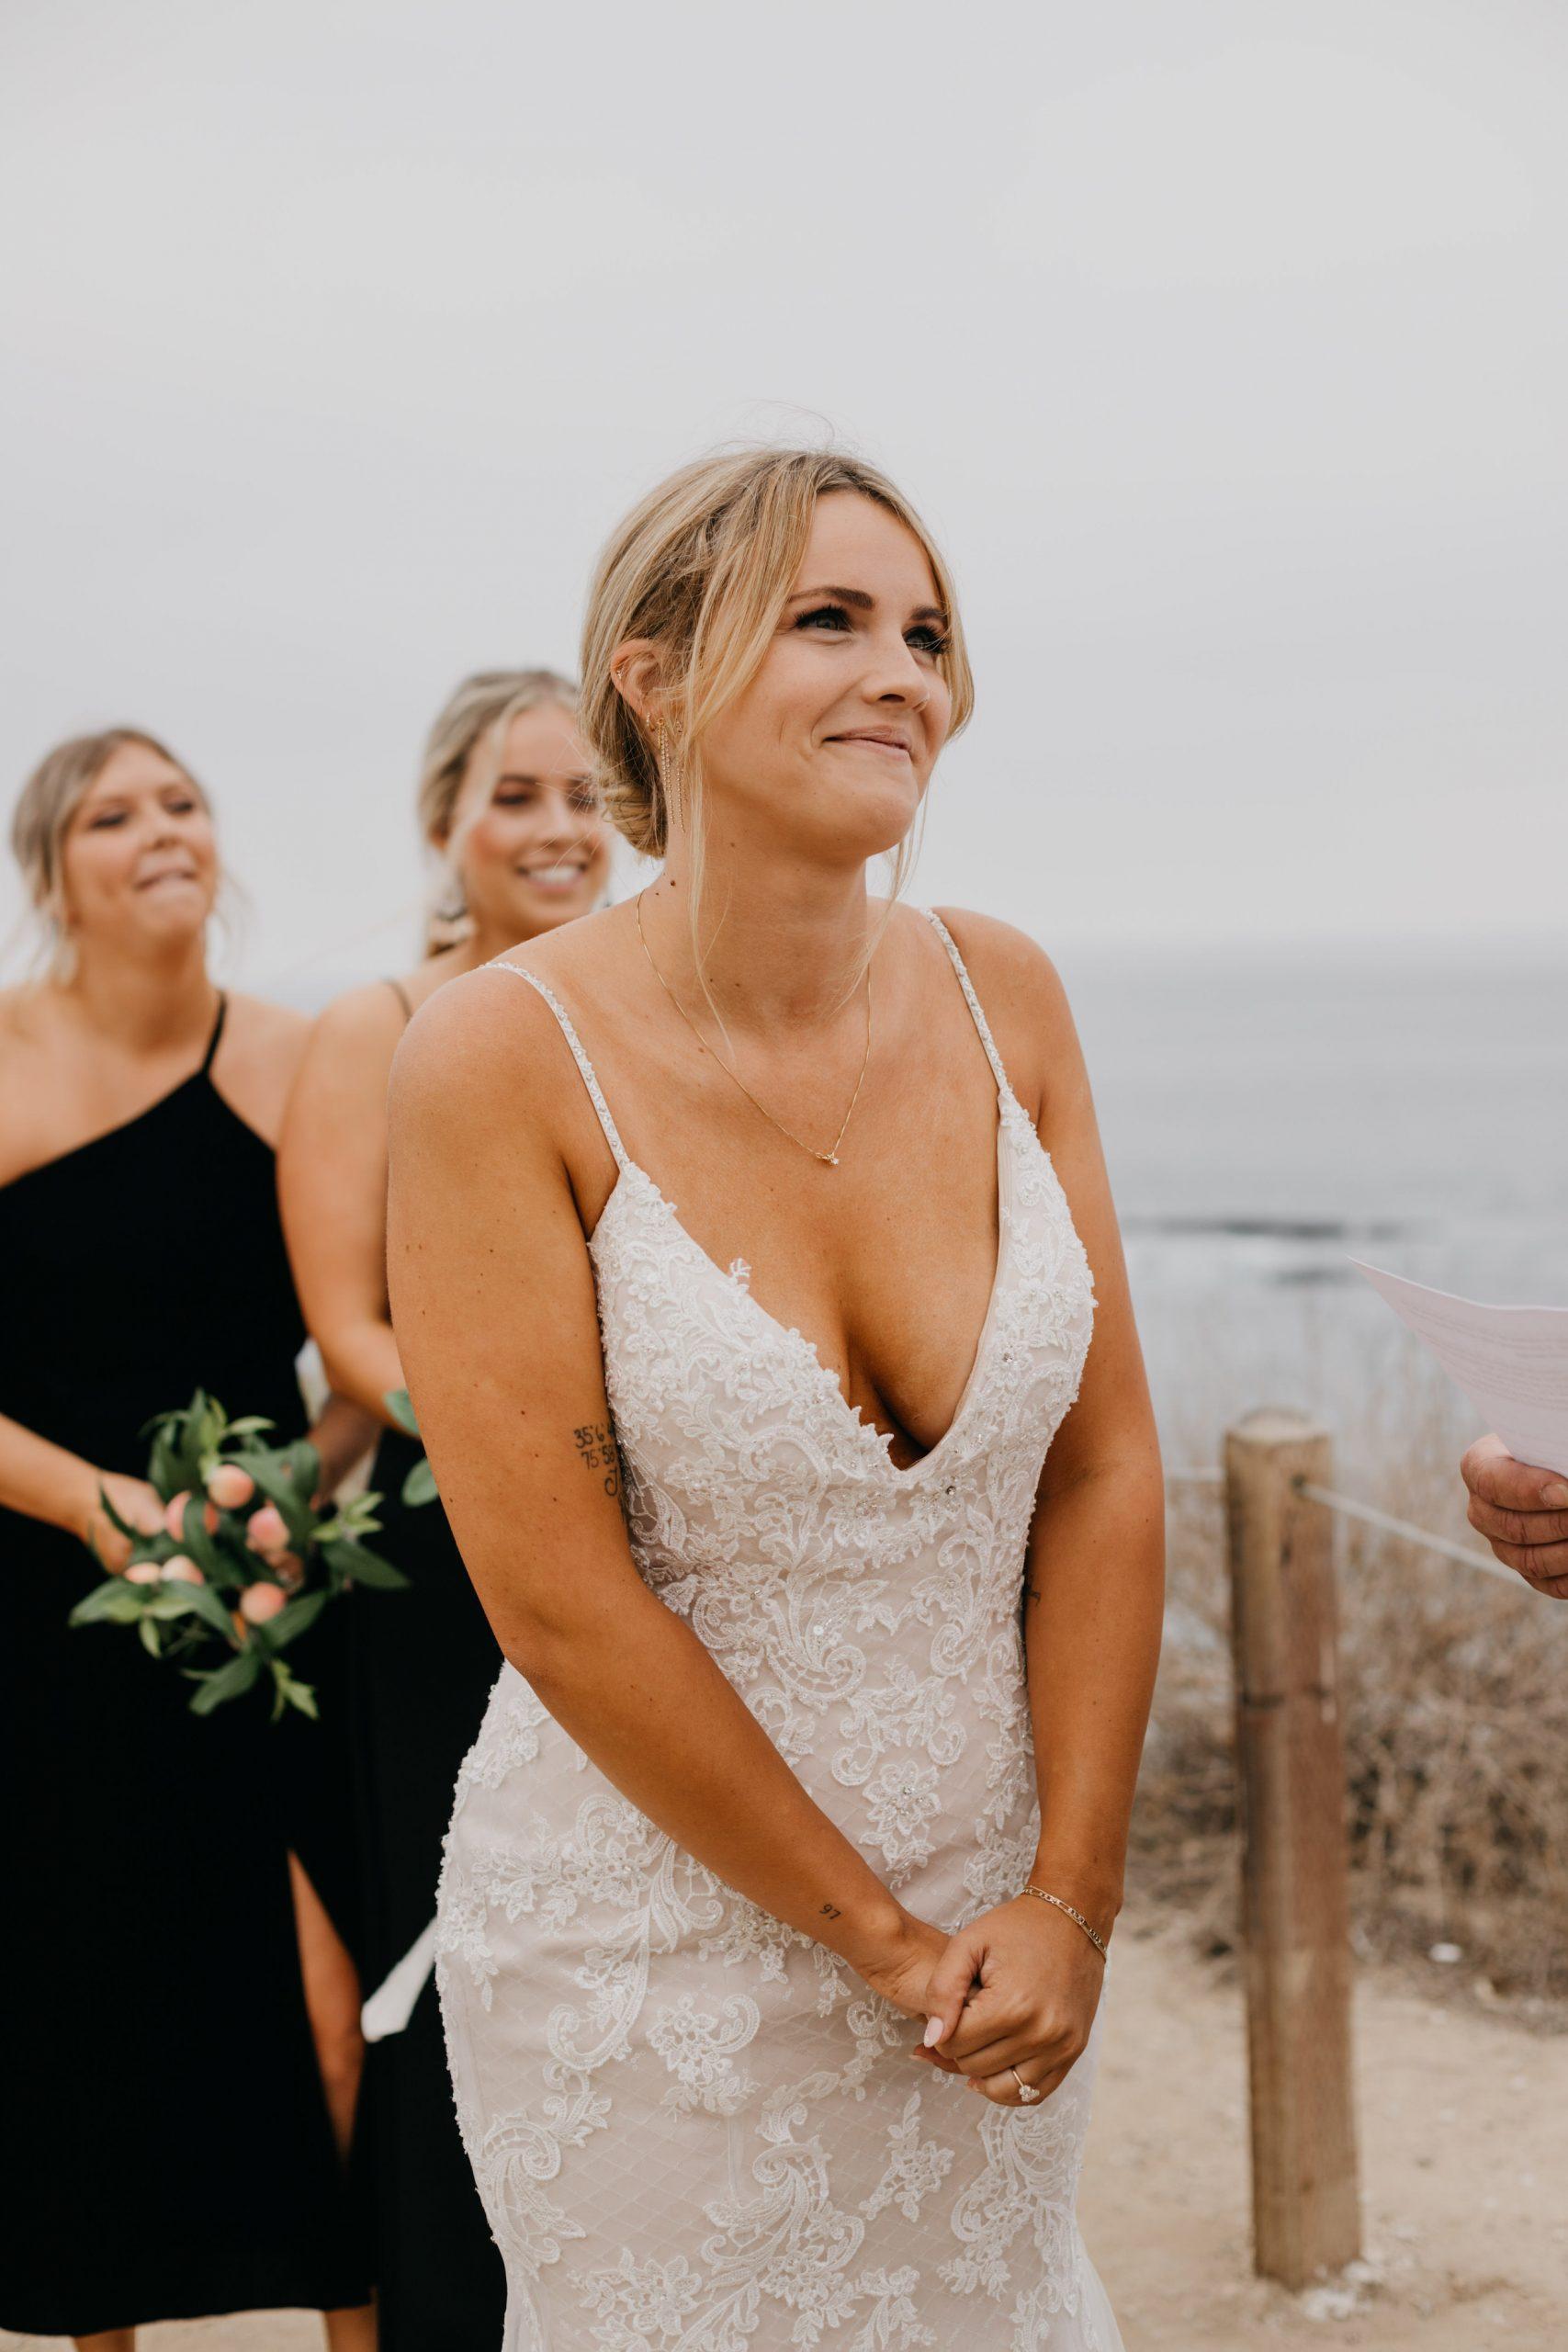 Bride in Ceremony in Crystal Cove State Park Wedding in Laguna Beach, image by Fatima Elreda Photo